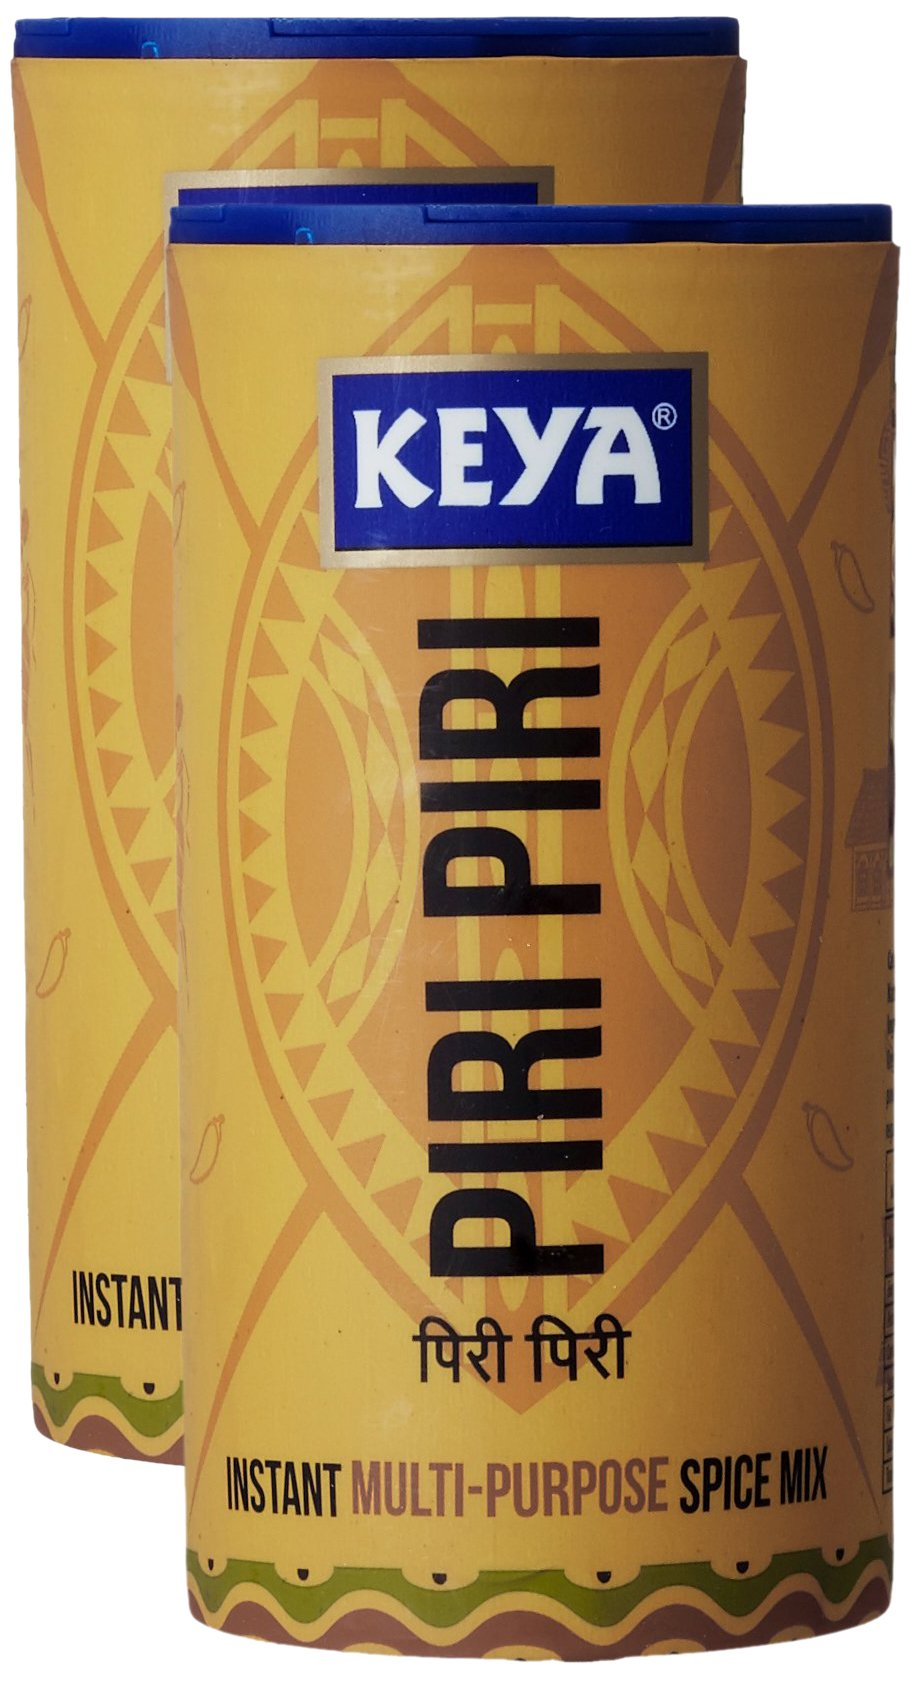 Keya Piri Piri Seasoning 80 grams (2.8 oz) - Vegetarian, India - Instant Multi Purpose Spice Mix - Pack of 2 by Keya